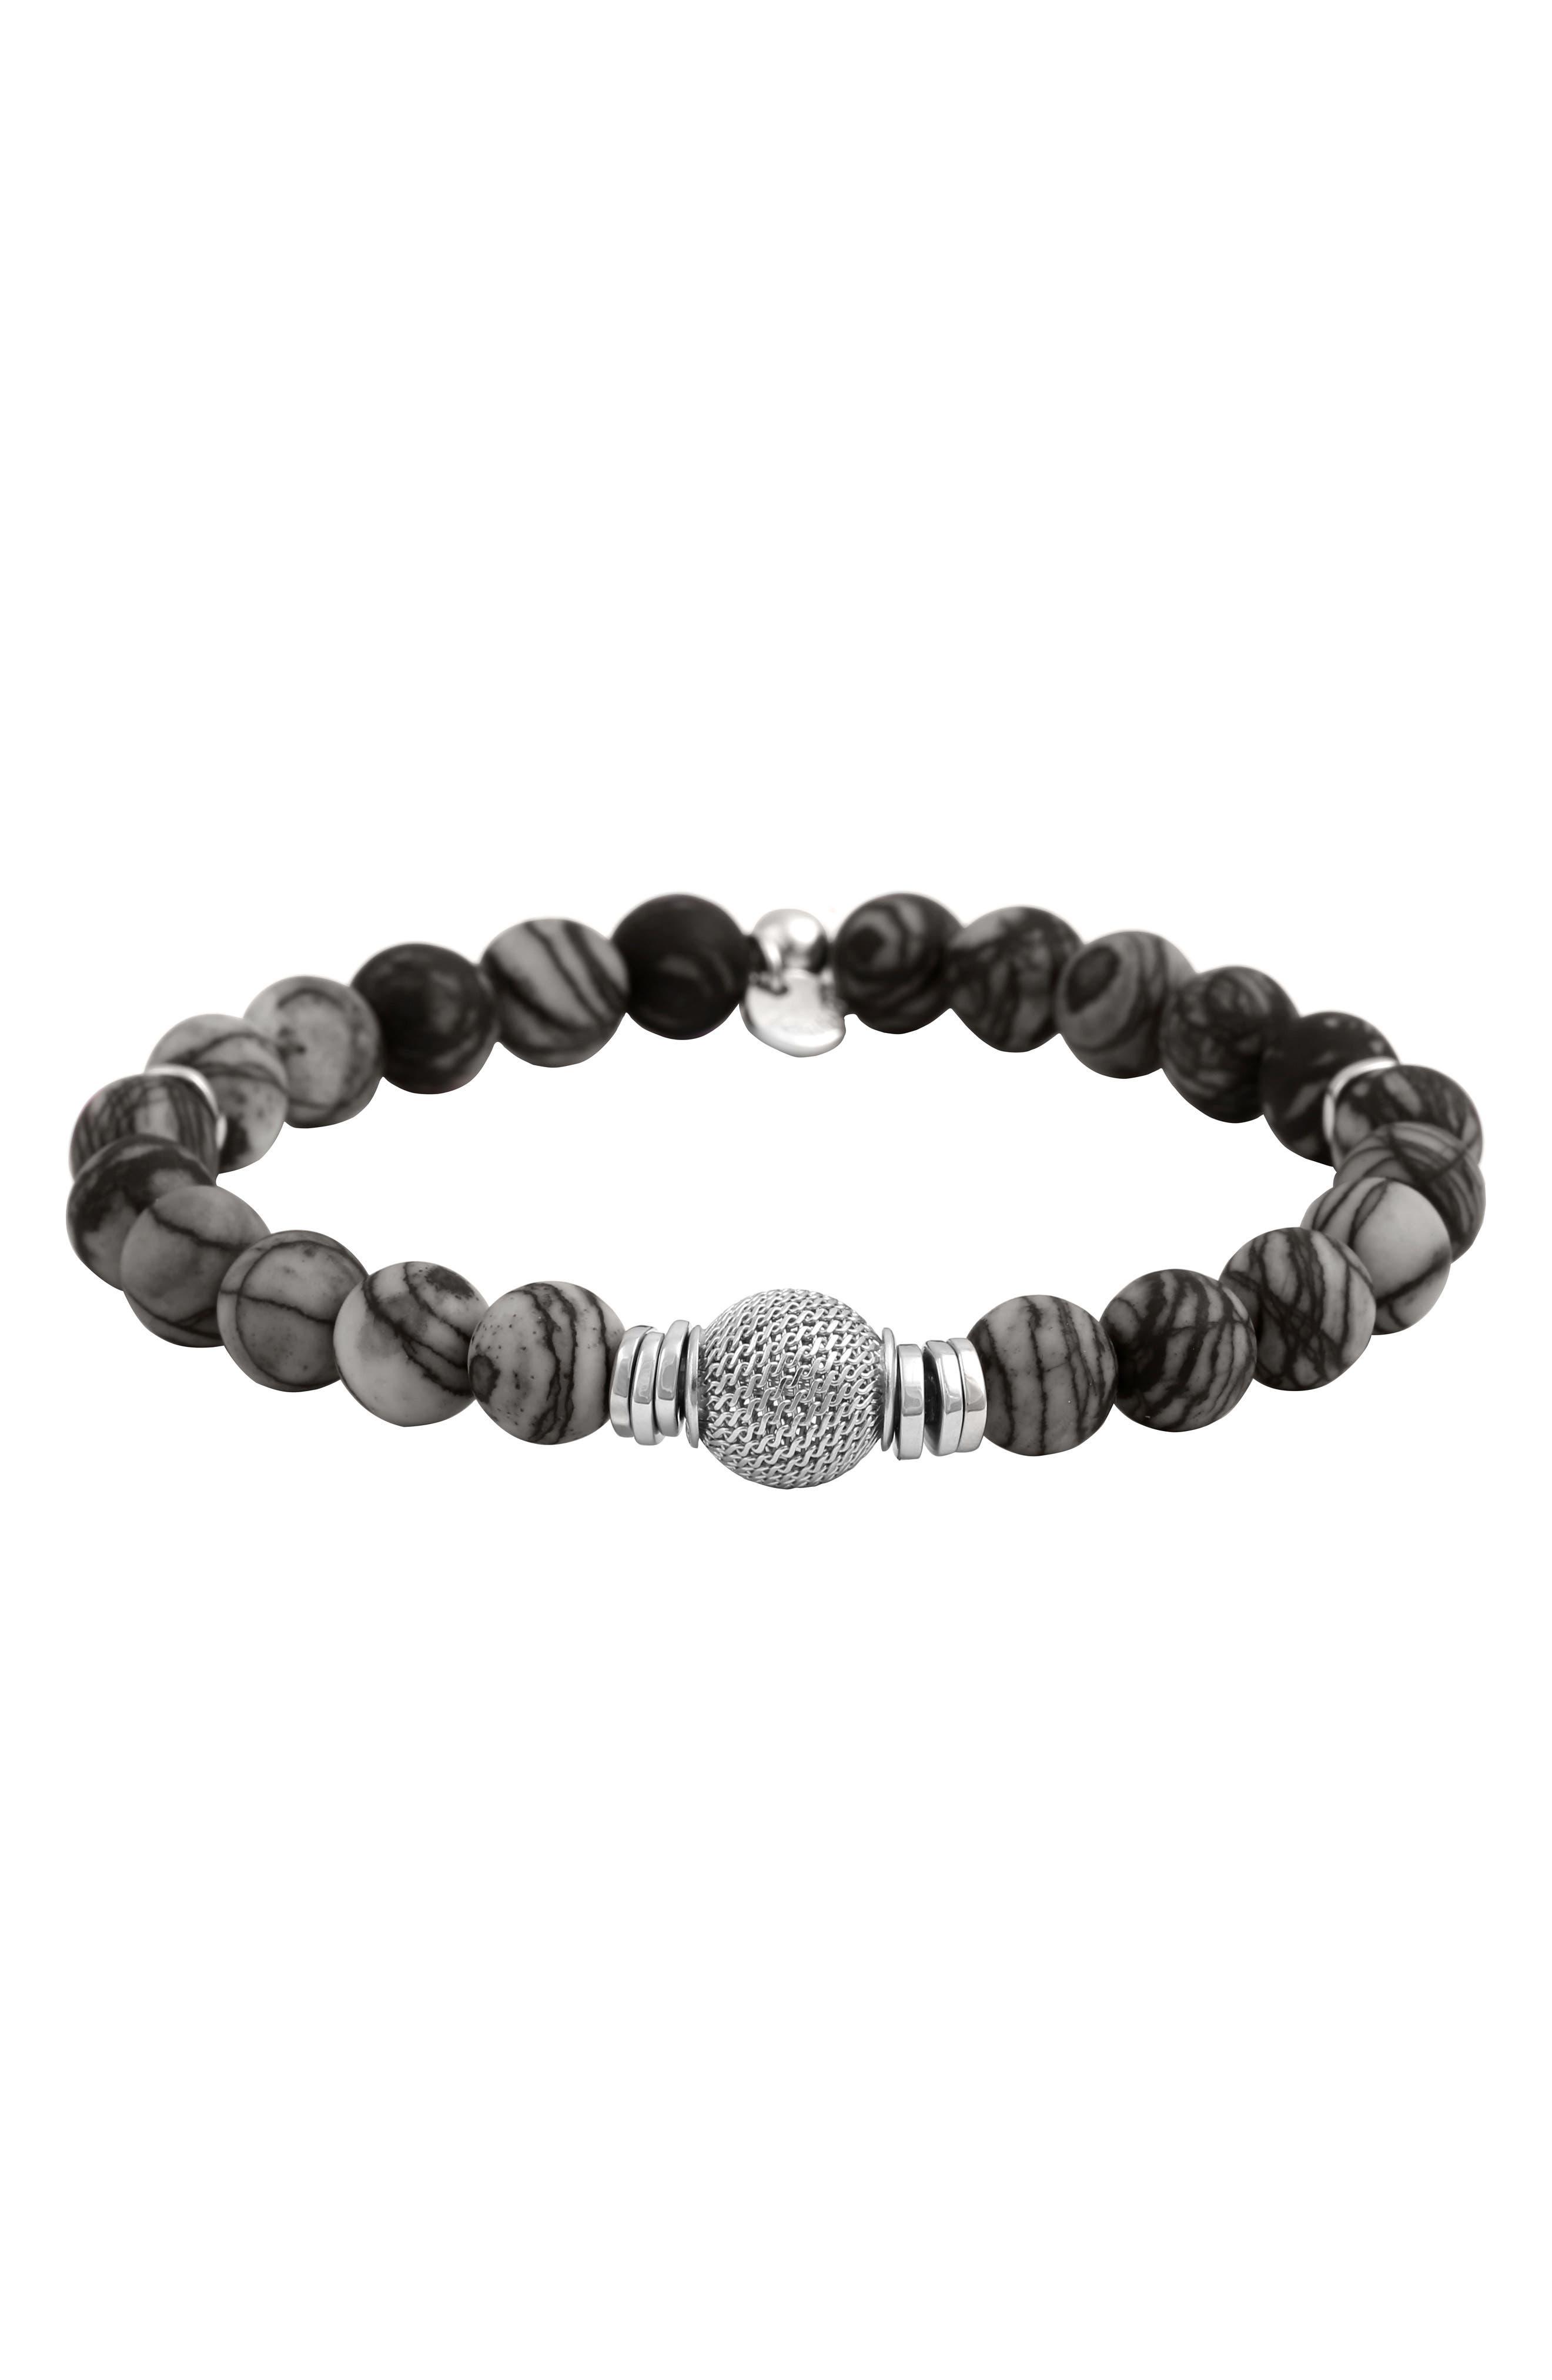 Alternate Image 1 Selected - Tateossian Stonehenge Bead Bracelet